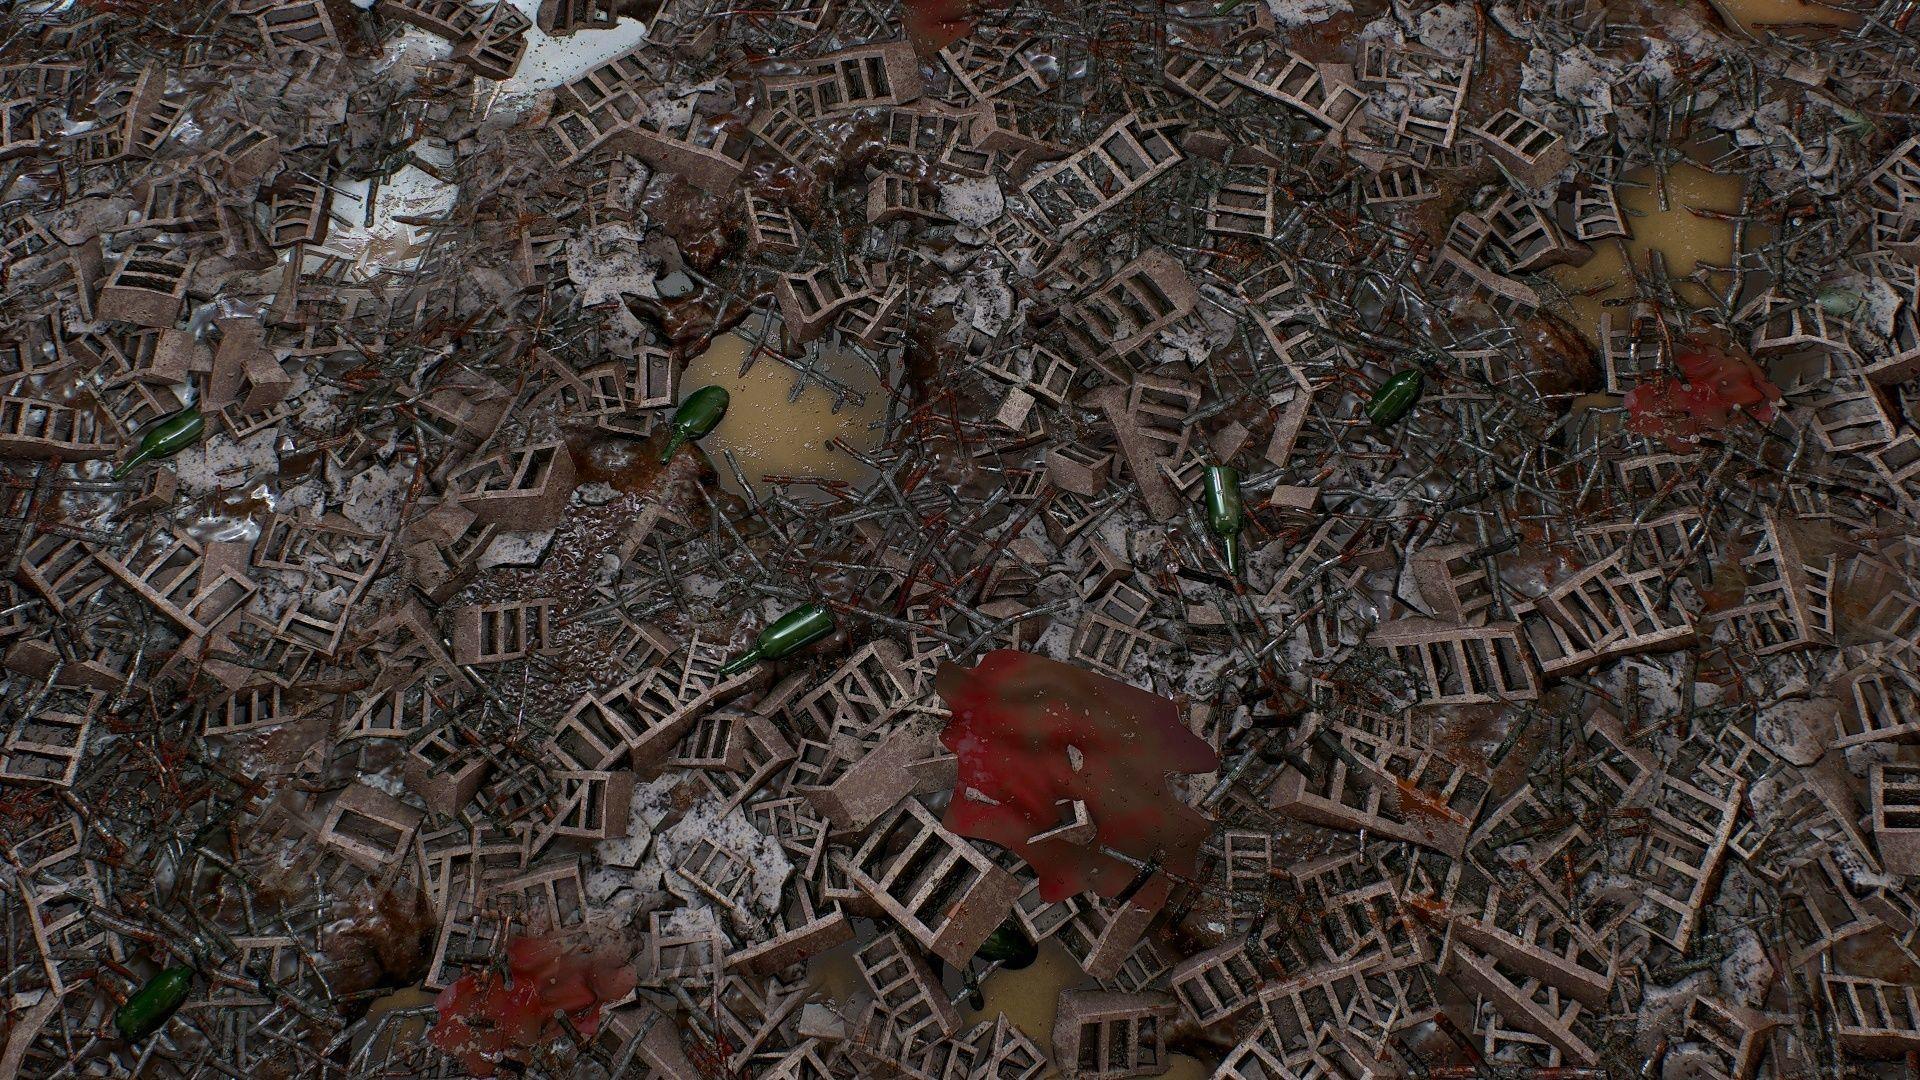 PBR seamless postapocalyptic dump ground textures